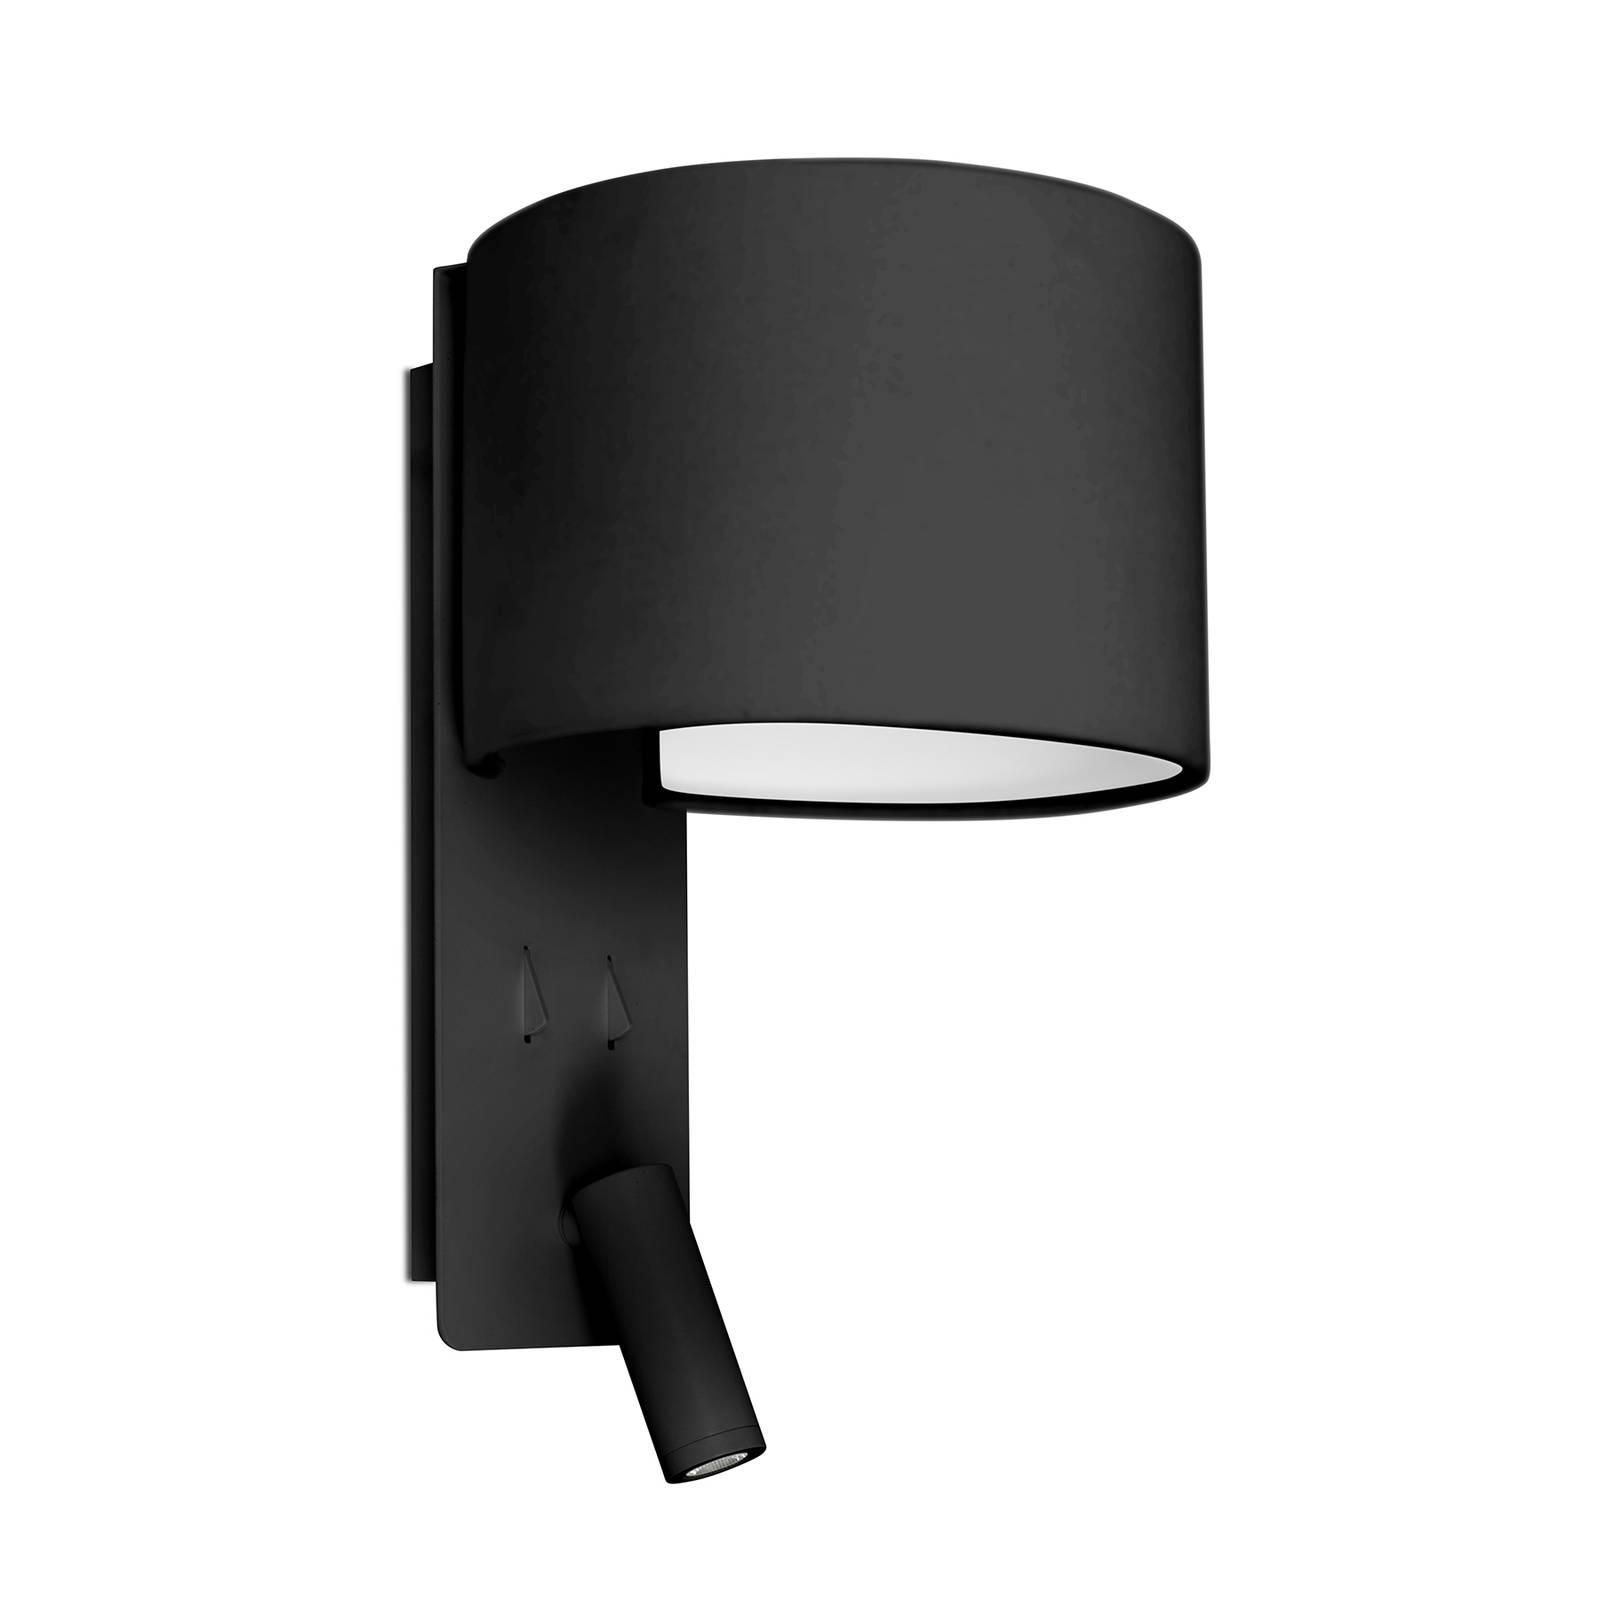 Wandleuchte Fold mit LED-Leseleuchte, schwarz